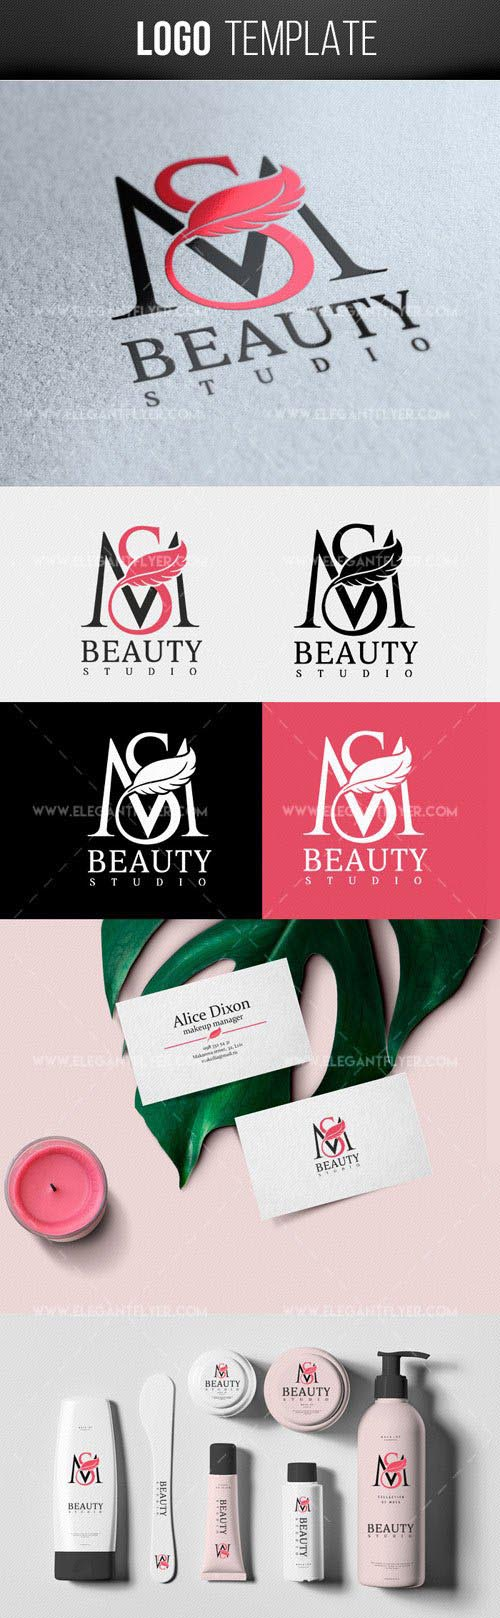 Beauty Studio Premium Logo Template